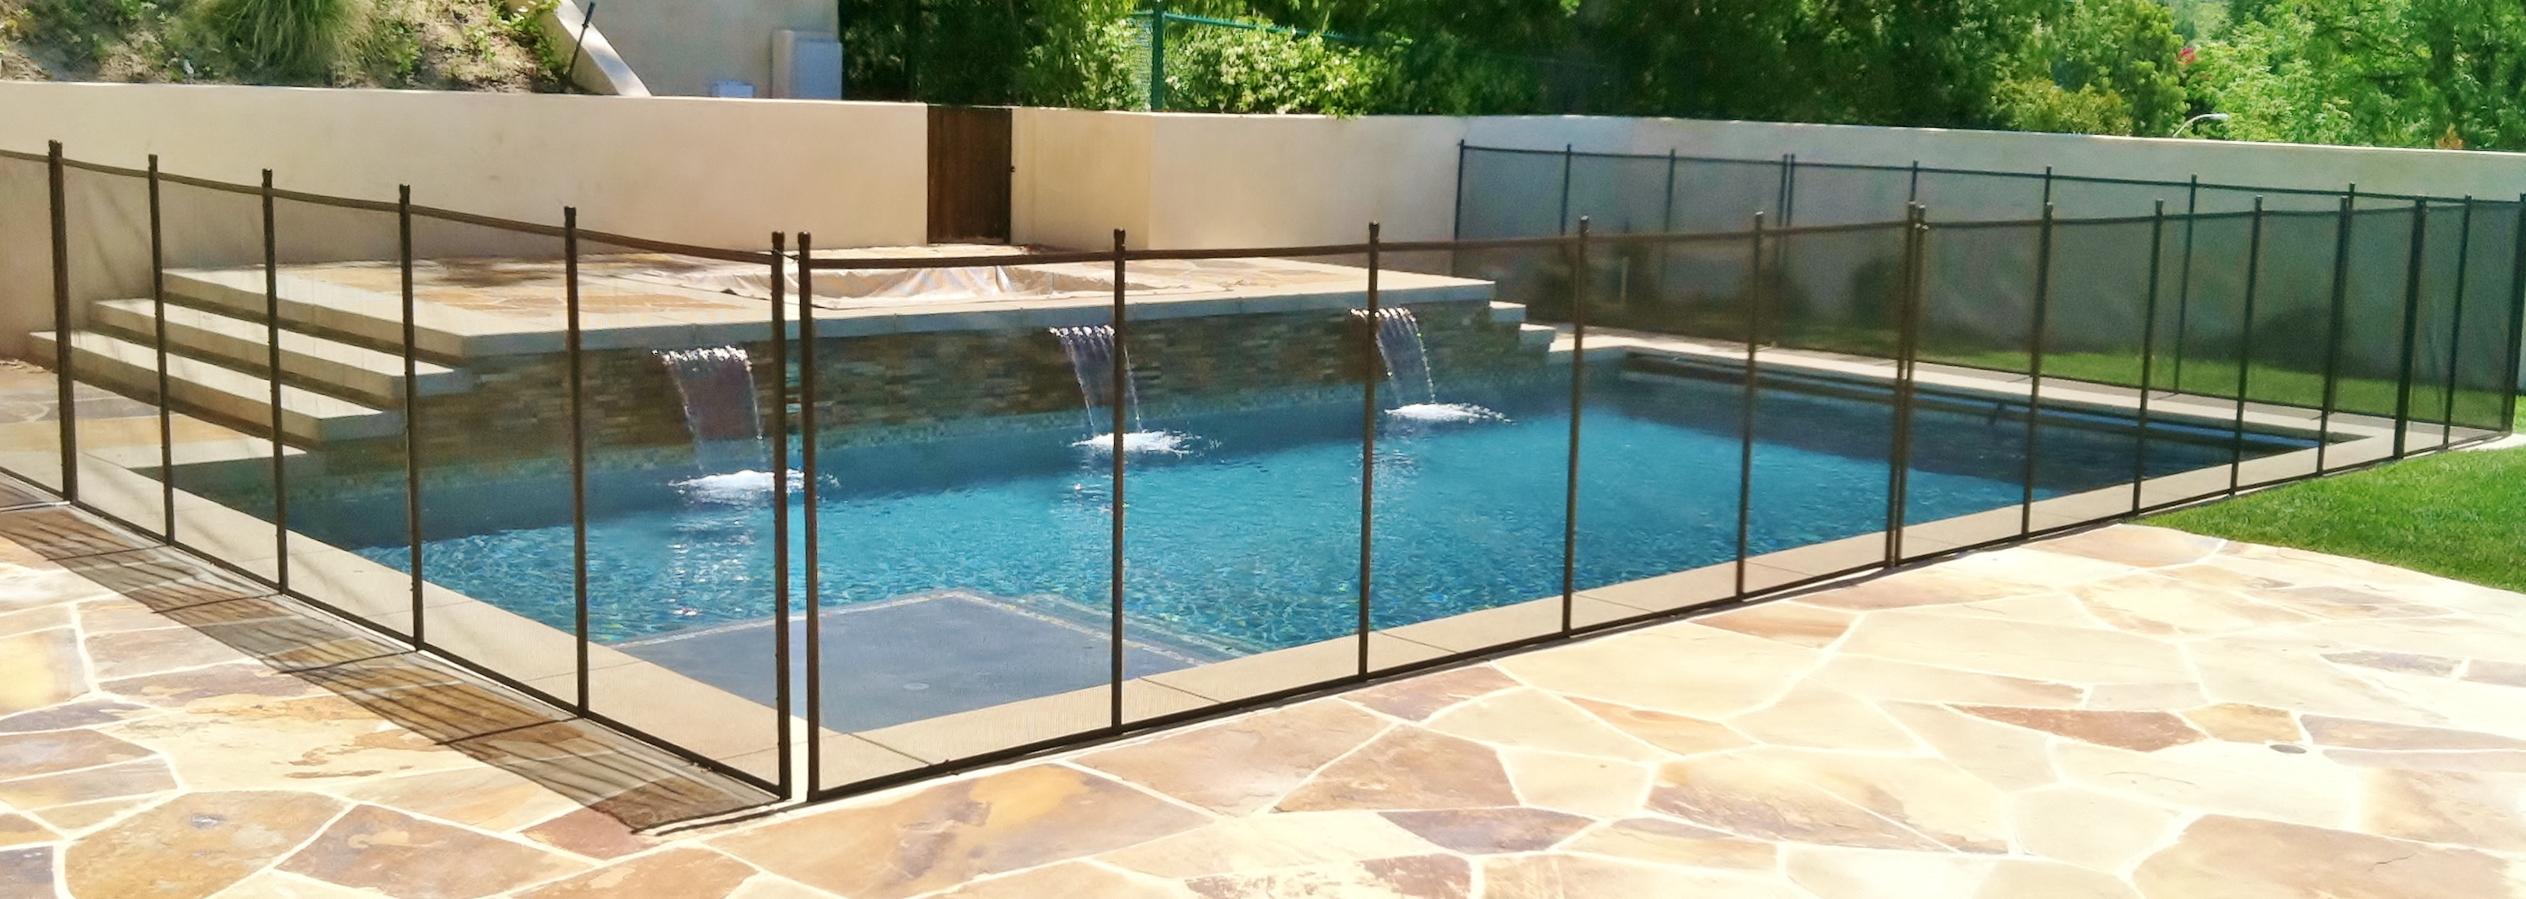 Safeguard Mesh Glass Pool Fence Company Coupons Near Me